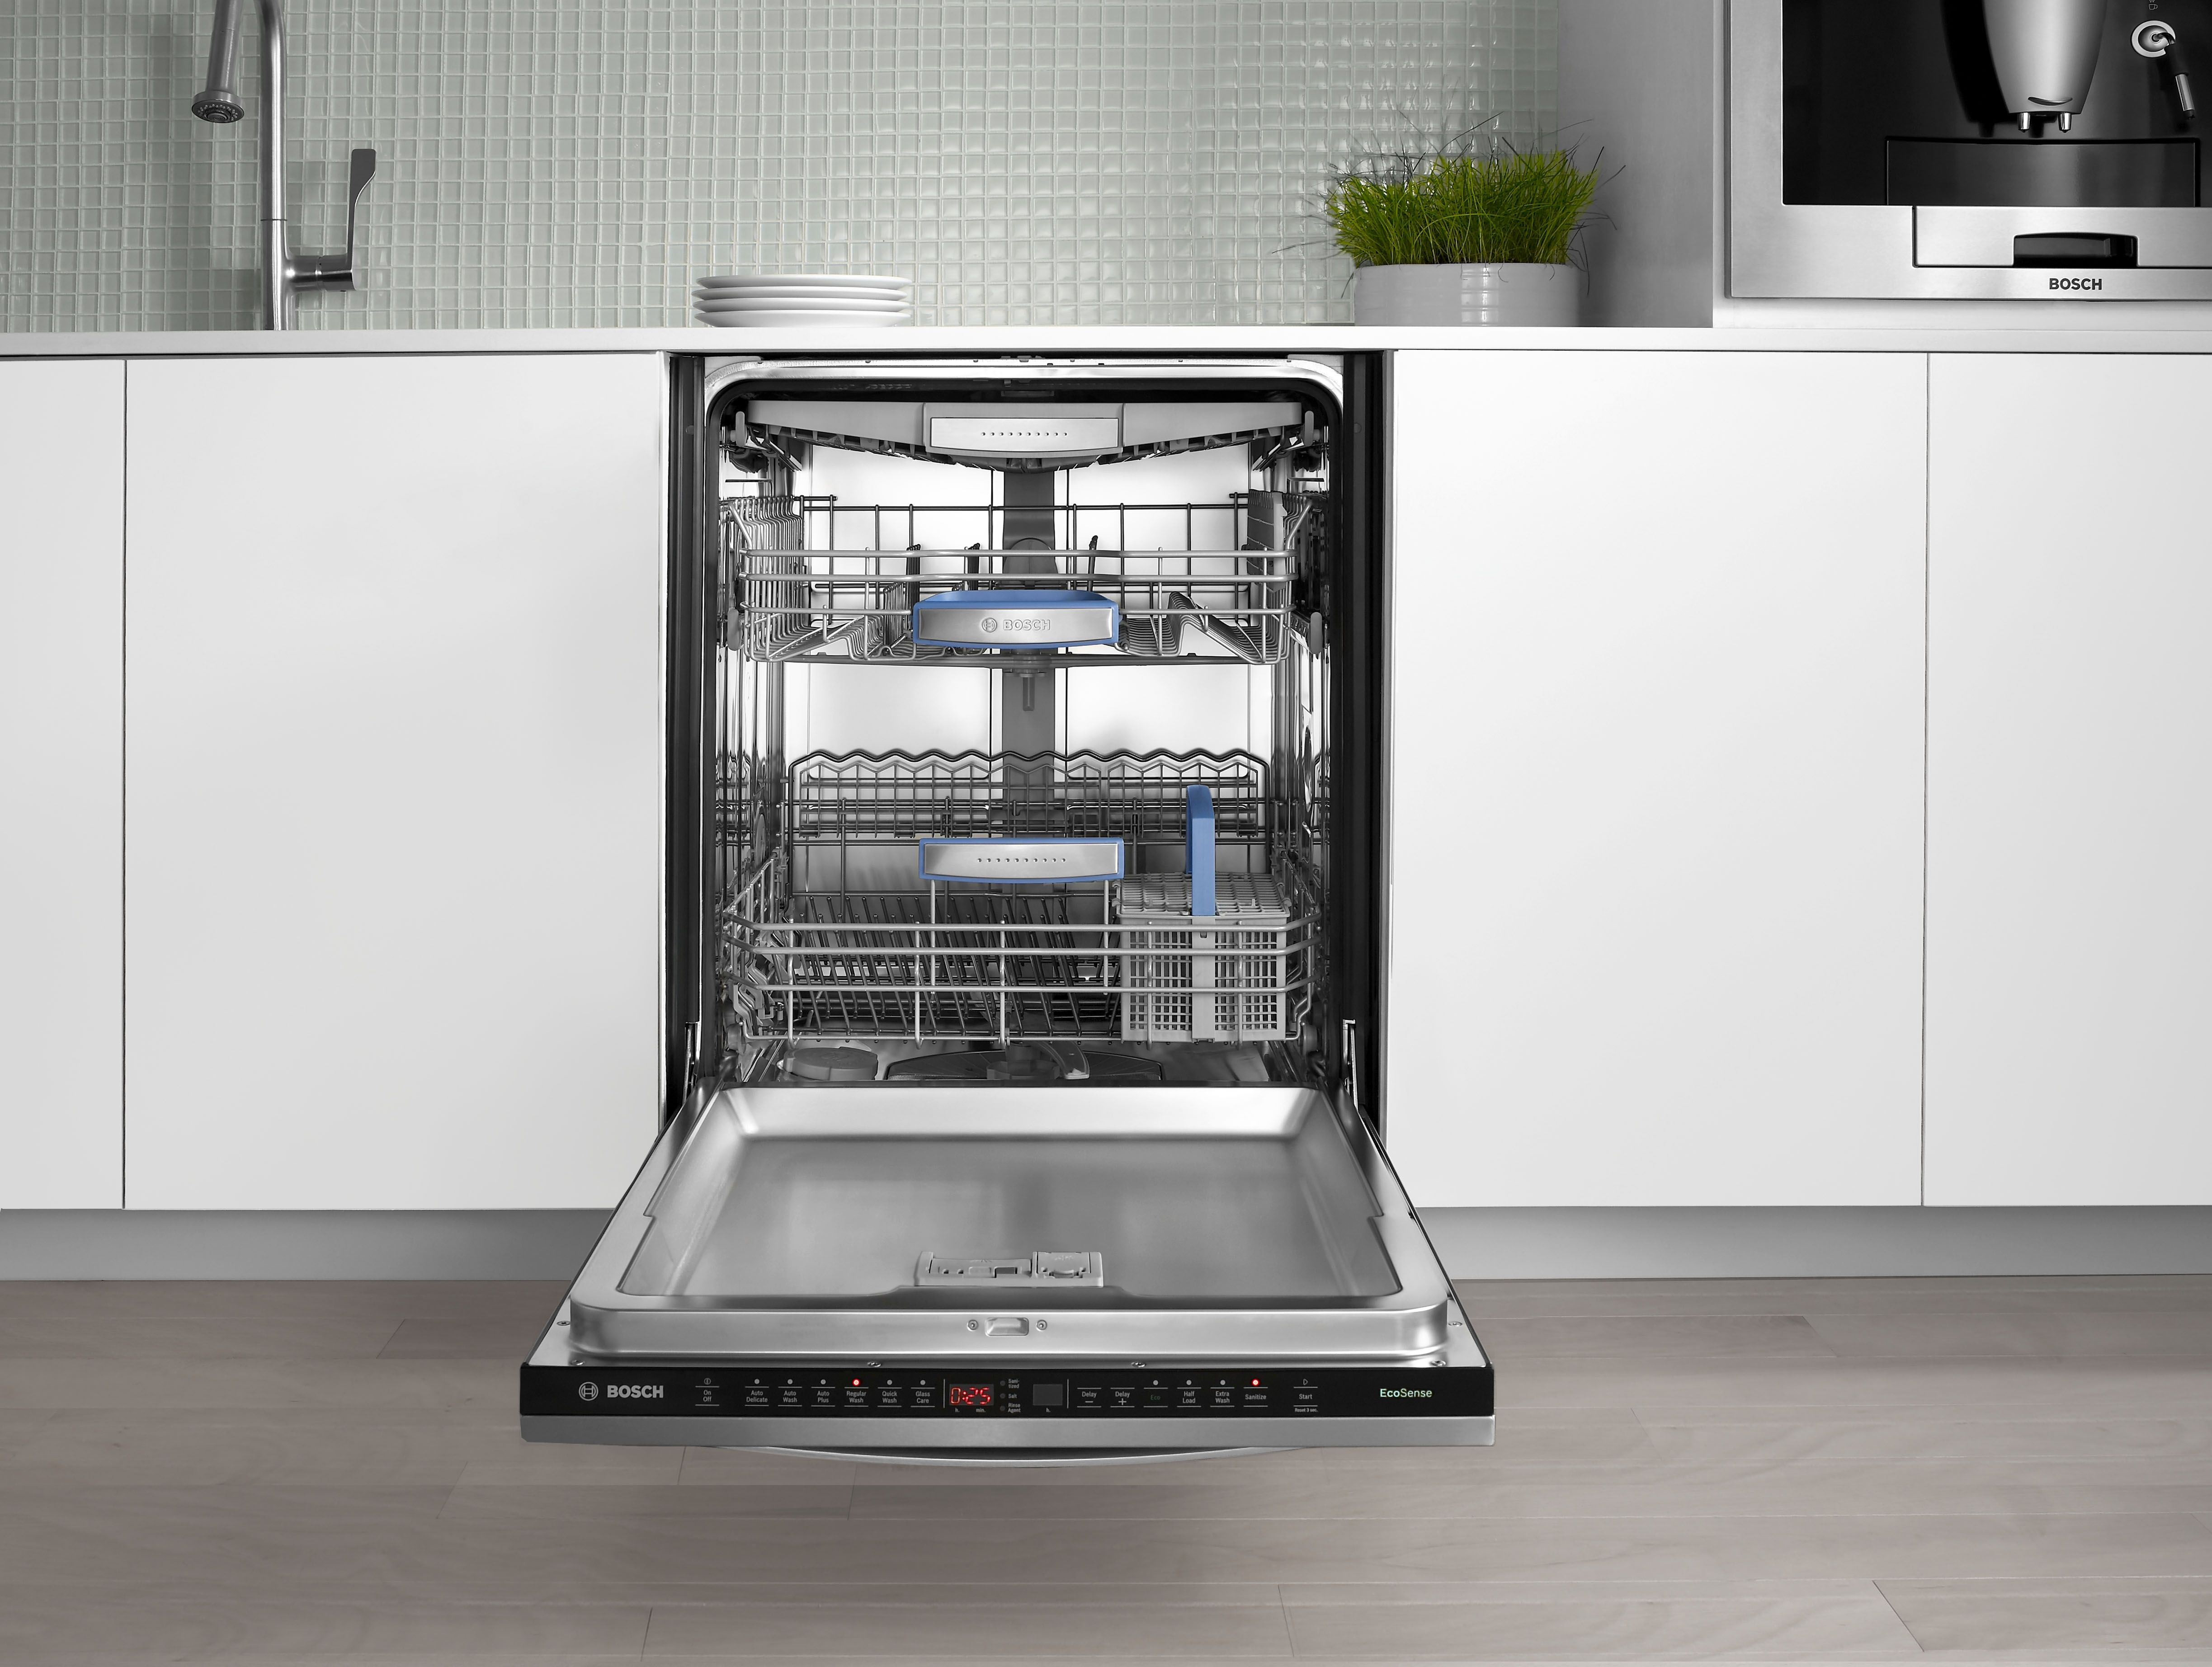 Bosch 800 Plus Dishwasher Door Open 3 Jpg 4893 3688 Bosch